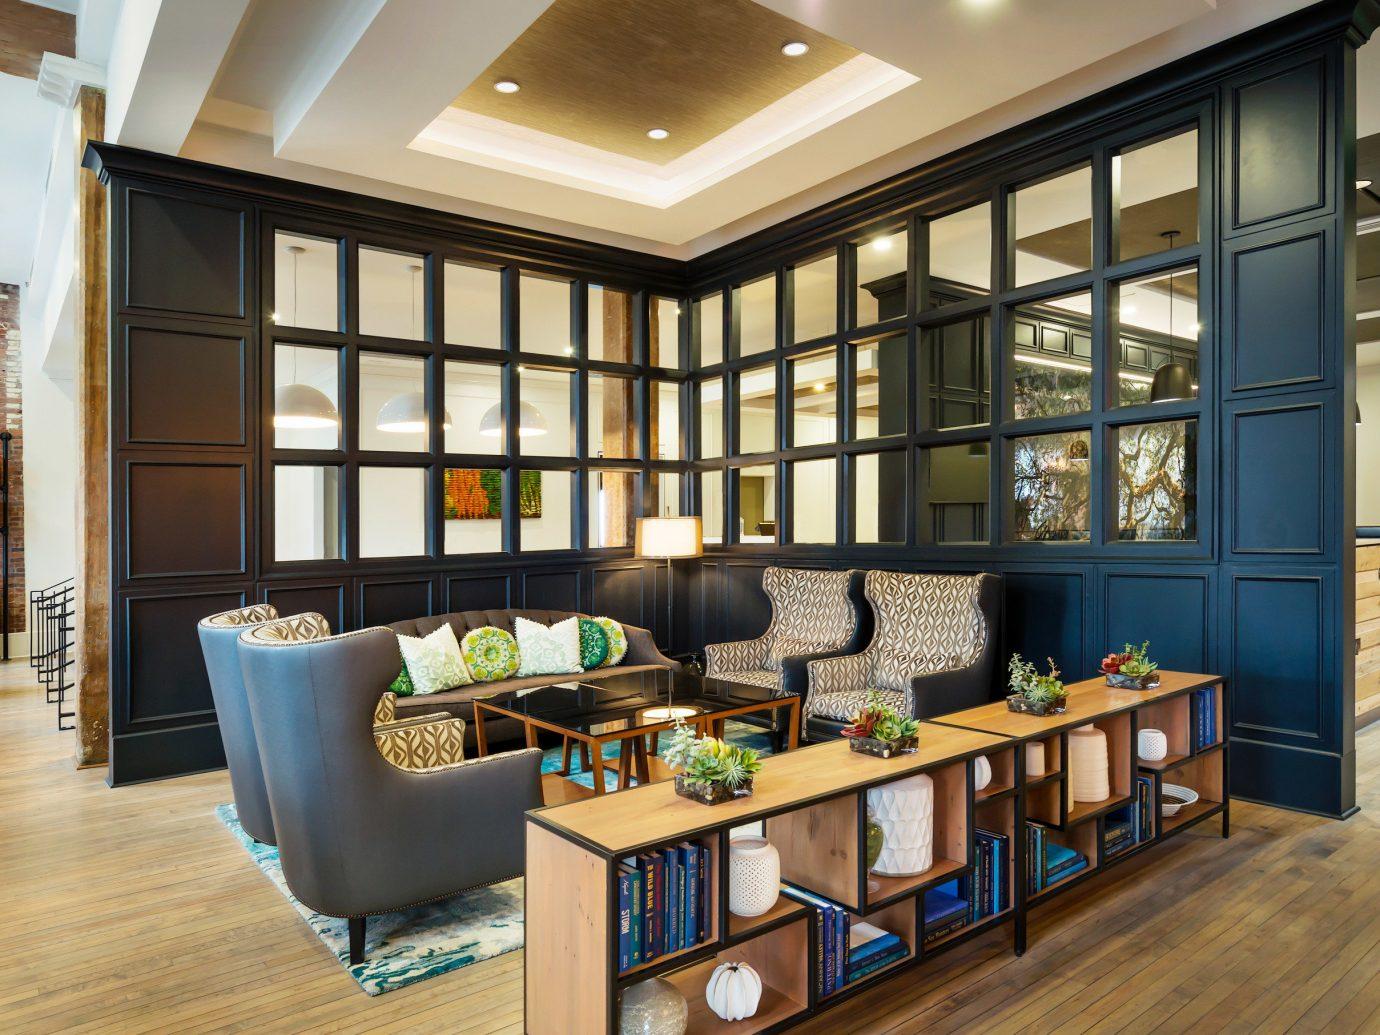 Boutique Hotels Food + Drink Girls Getaways Weekend Getaways floor indoor Living room window interior design furniture Lobby living room ceiling wood loft area hard